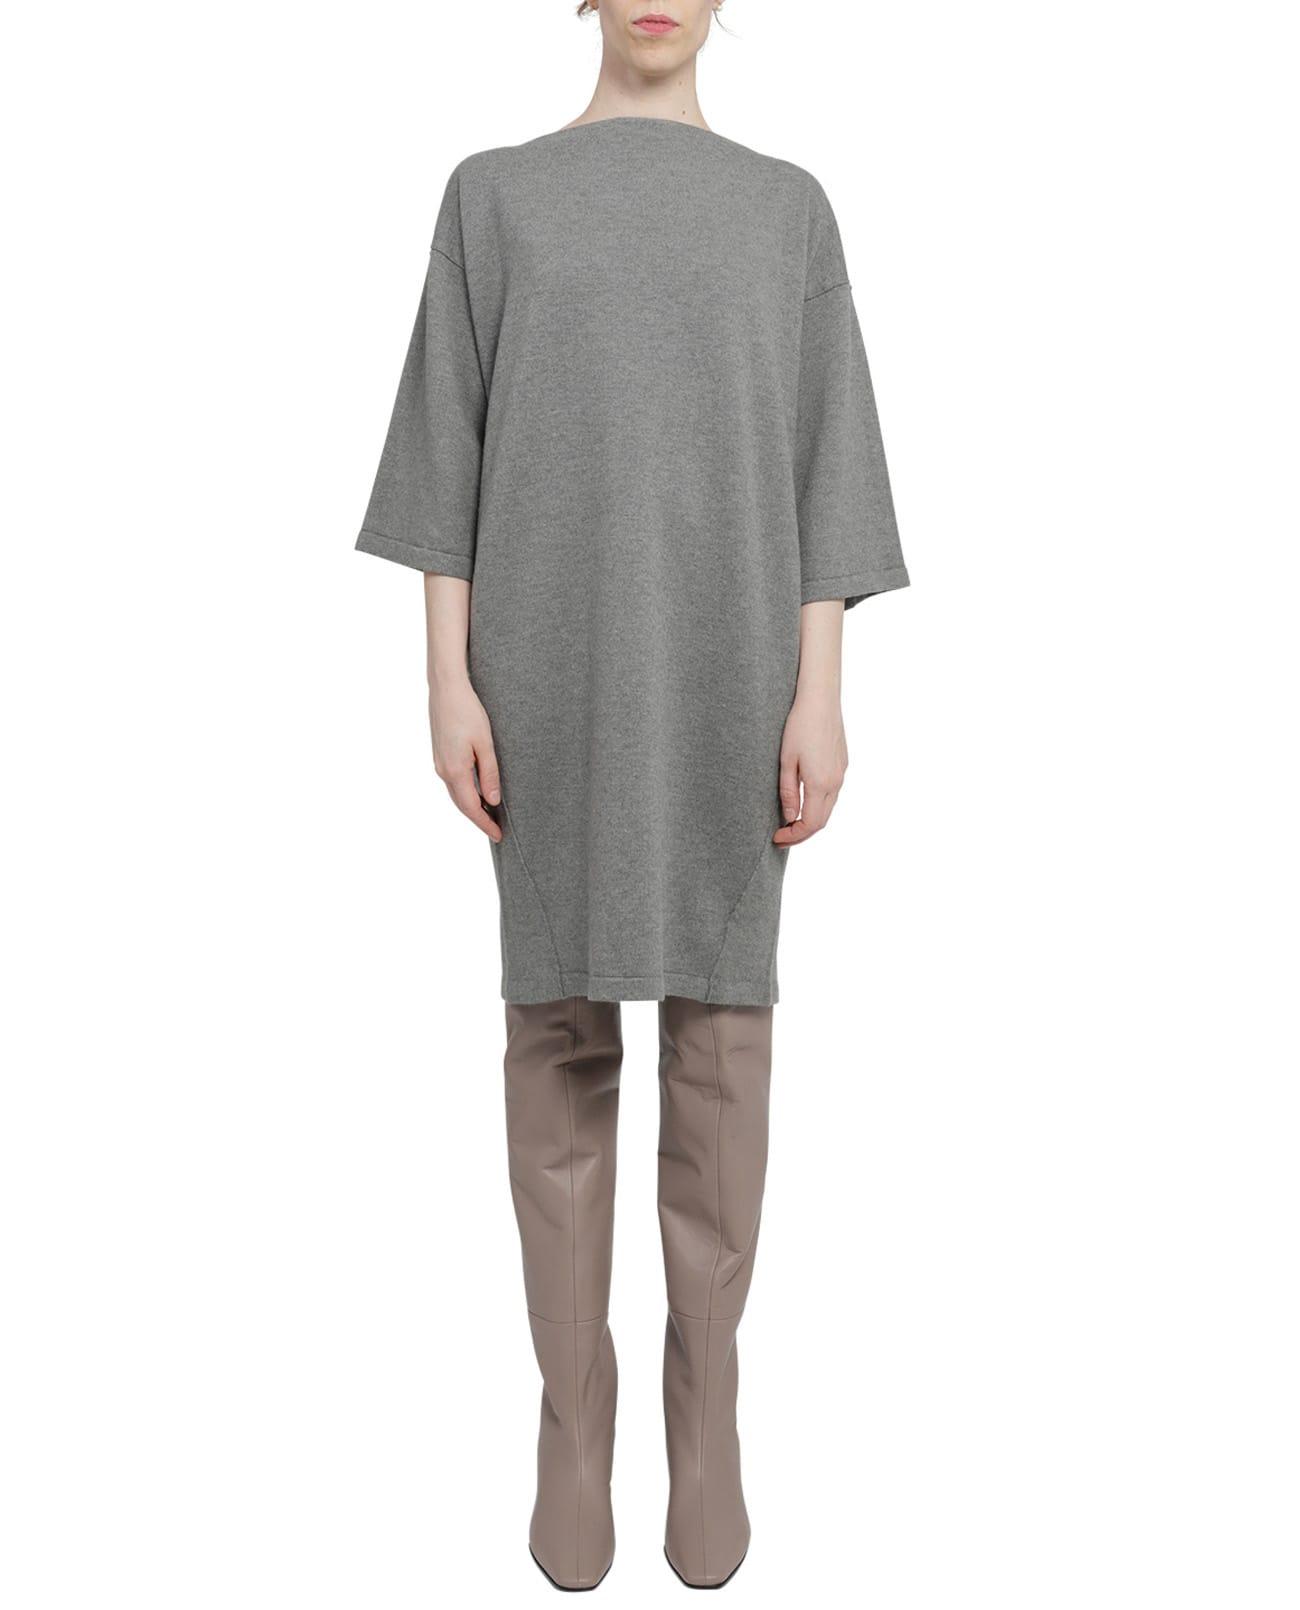 Portofino Light Grey Dress